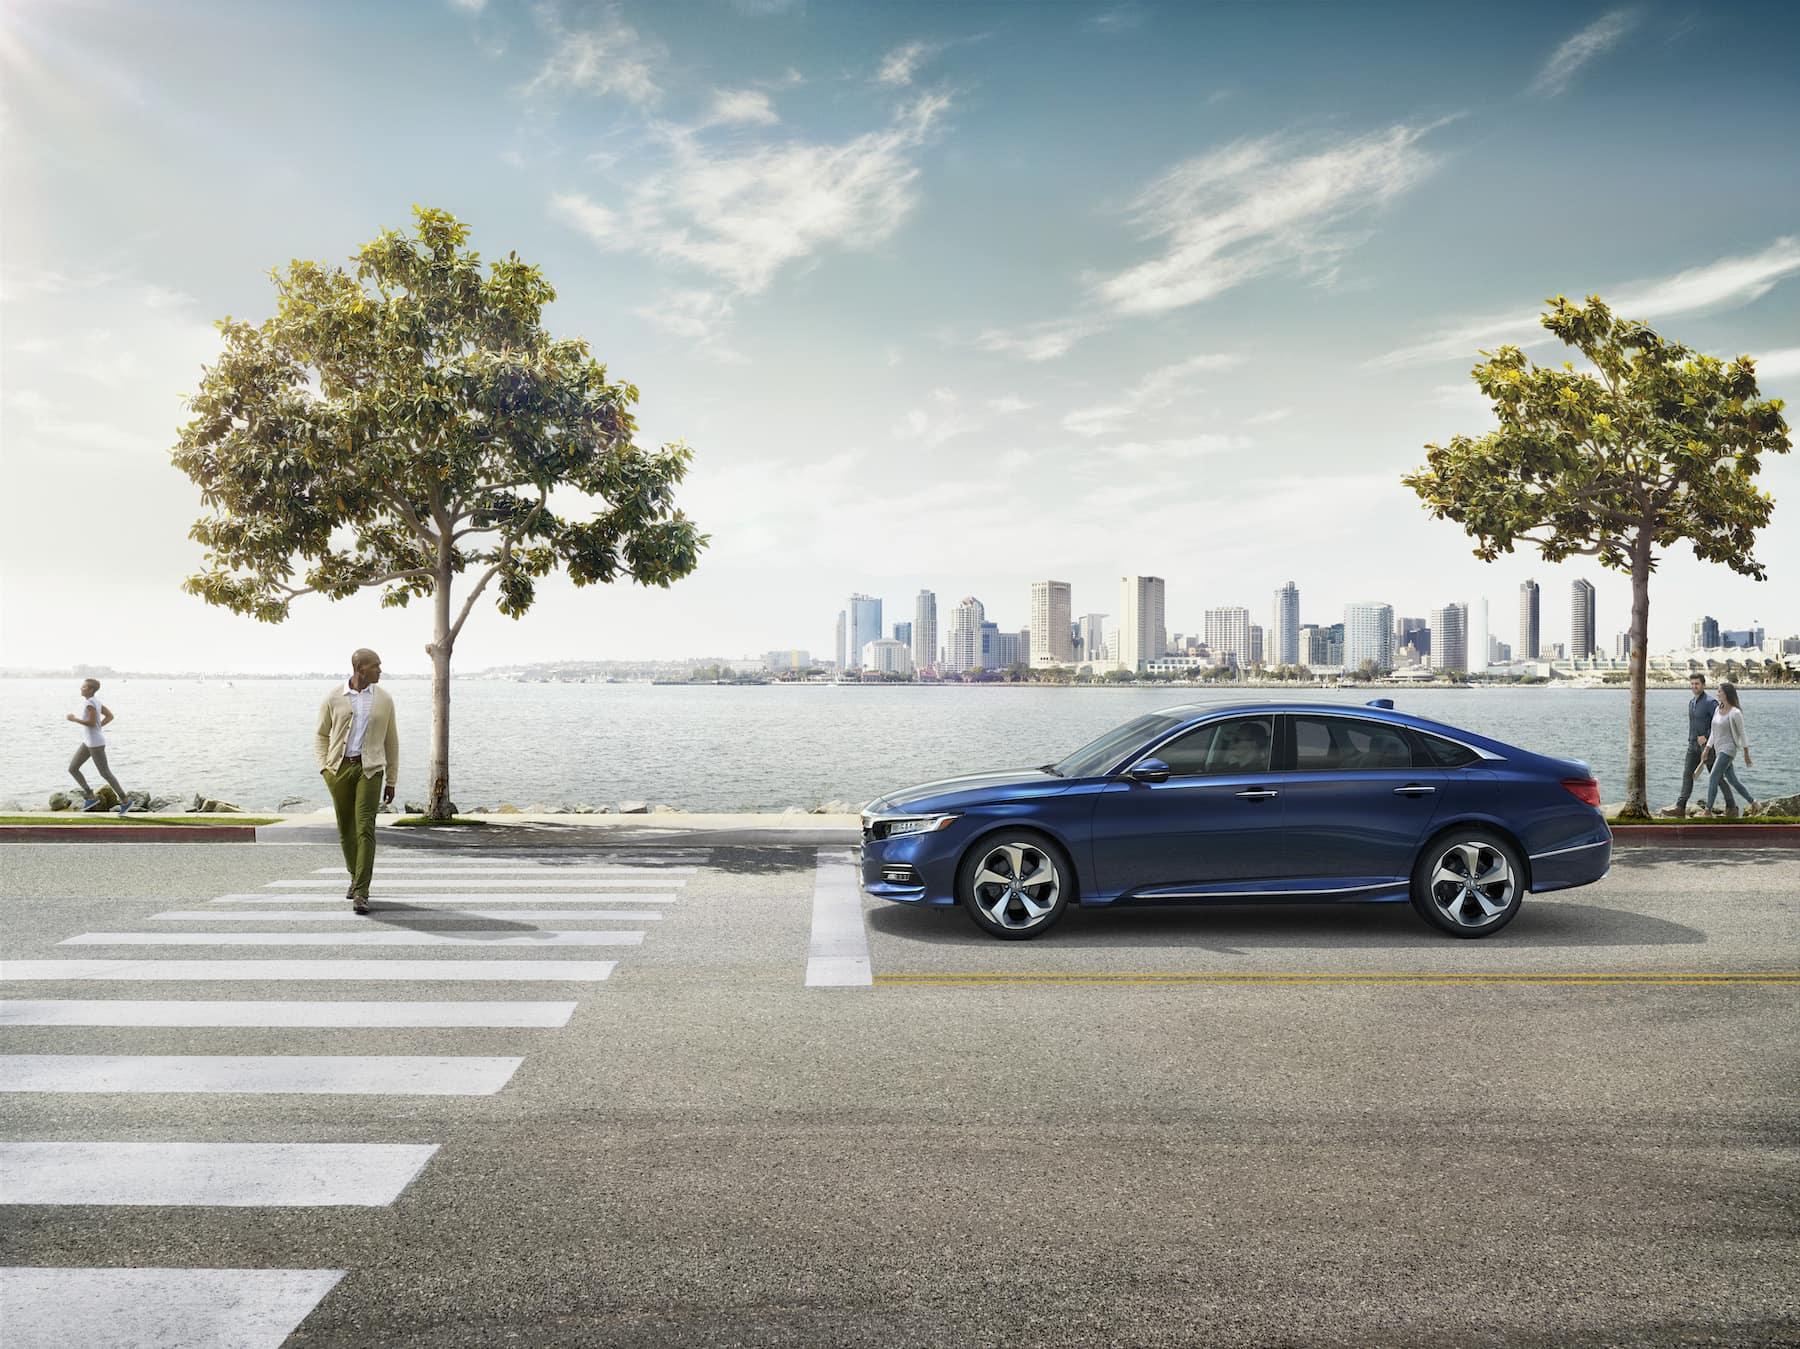 Comparison of the 2020 Civic Sedan vs. the 2020 Accord at Boch Honda West of Westford MA | blue 2020 honda accord on the street